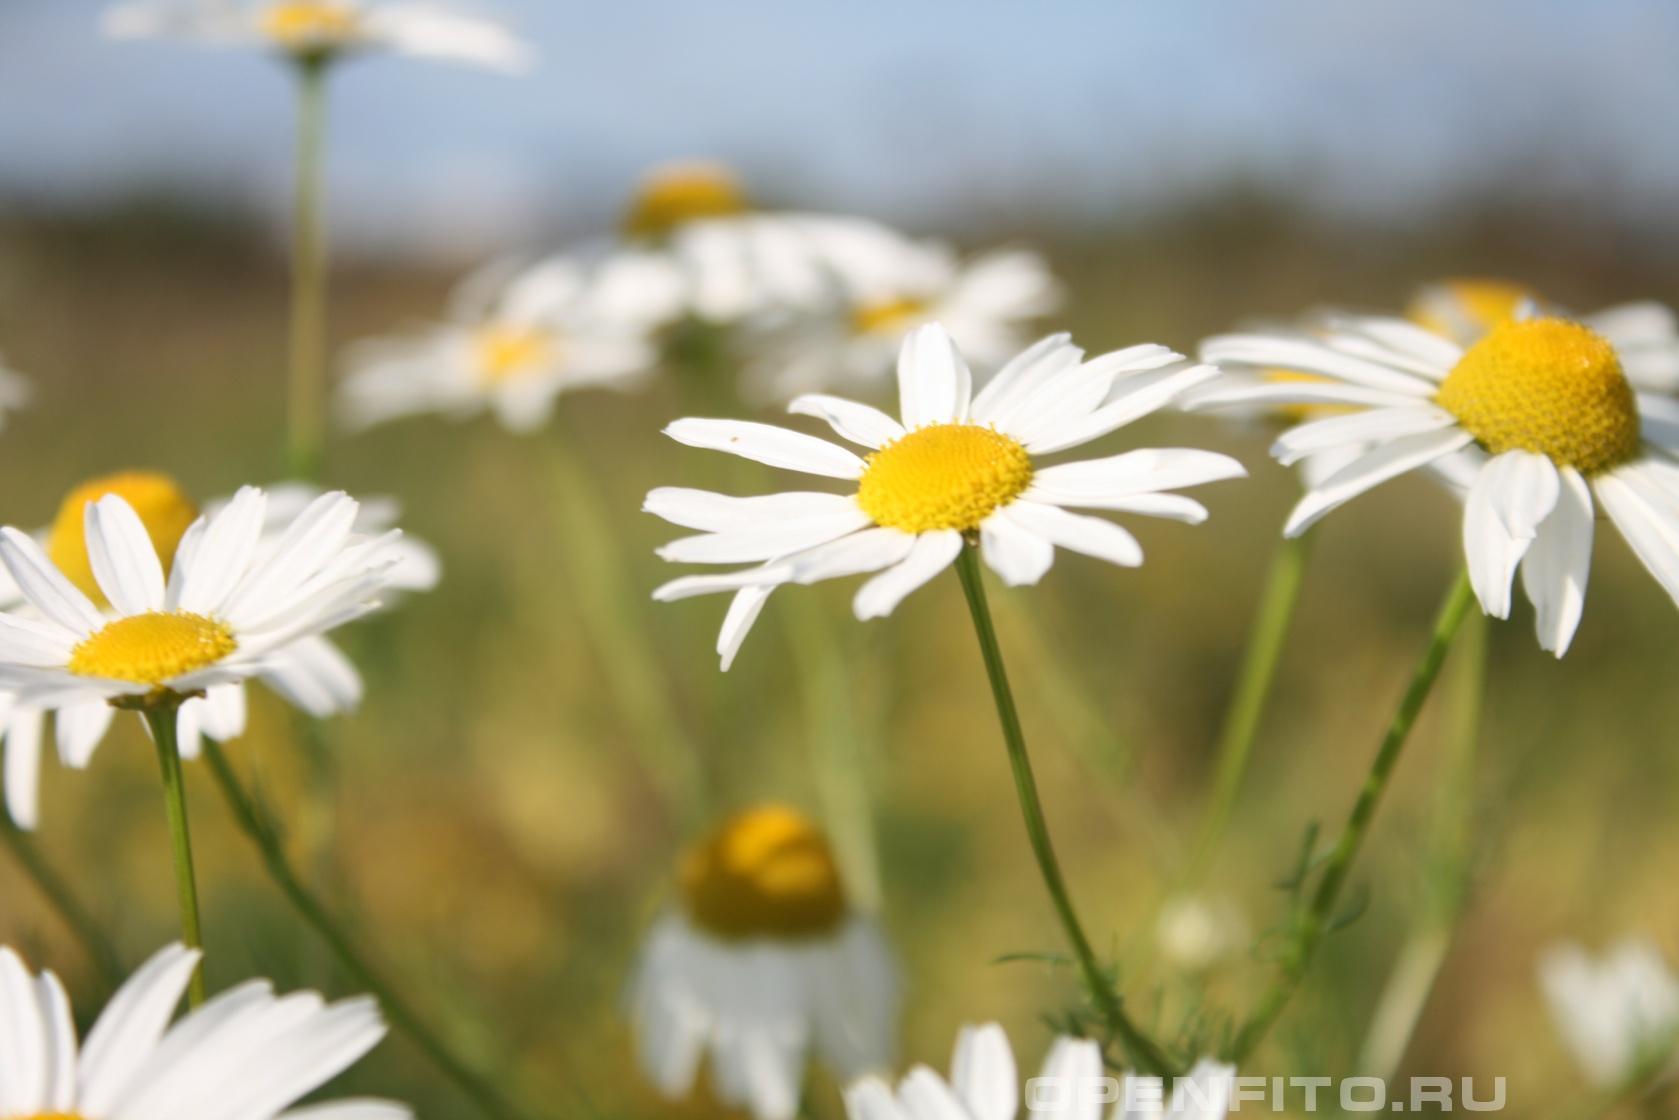 Ромашка аптечная <p>Фото цветков</p>